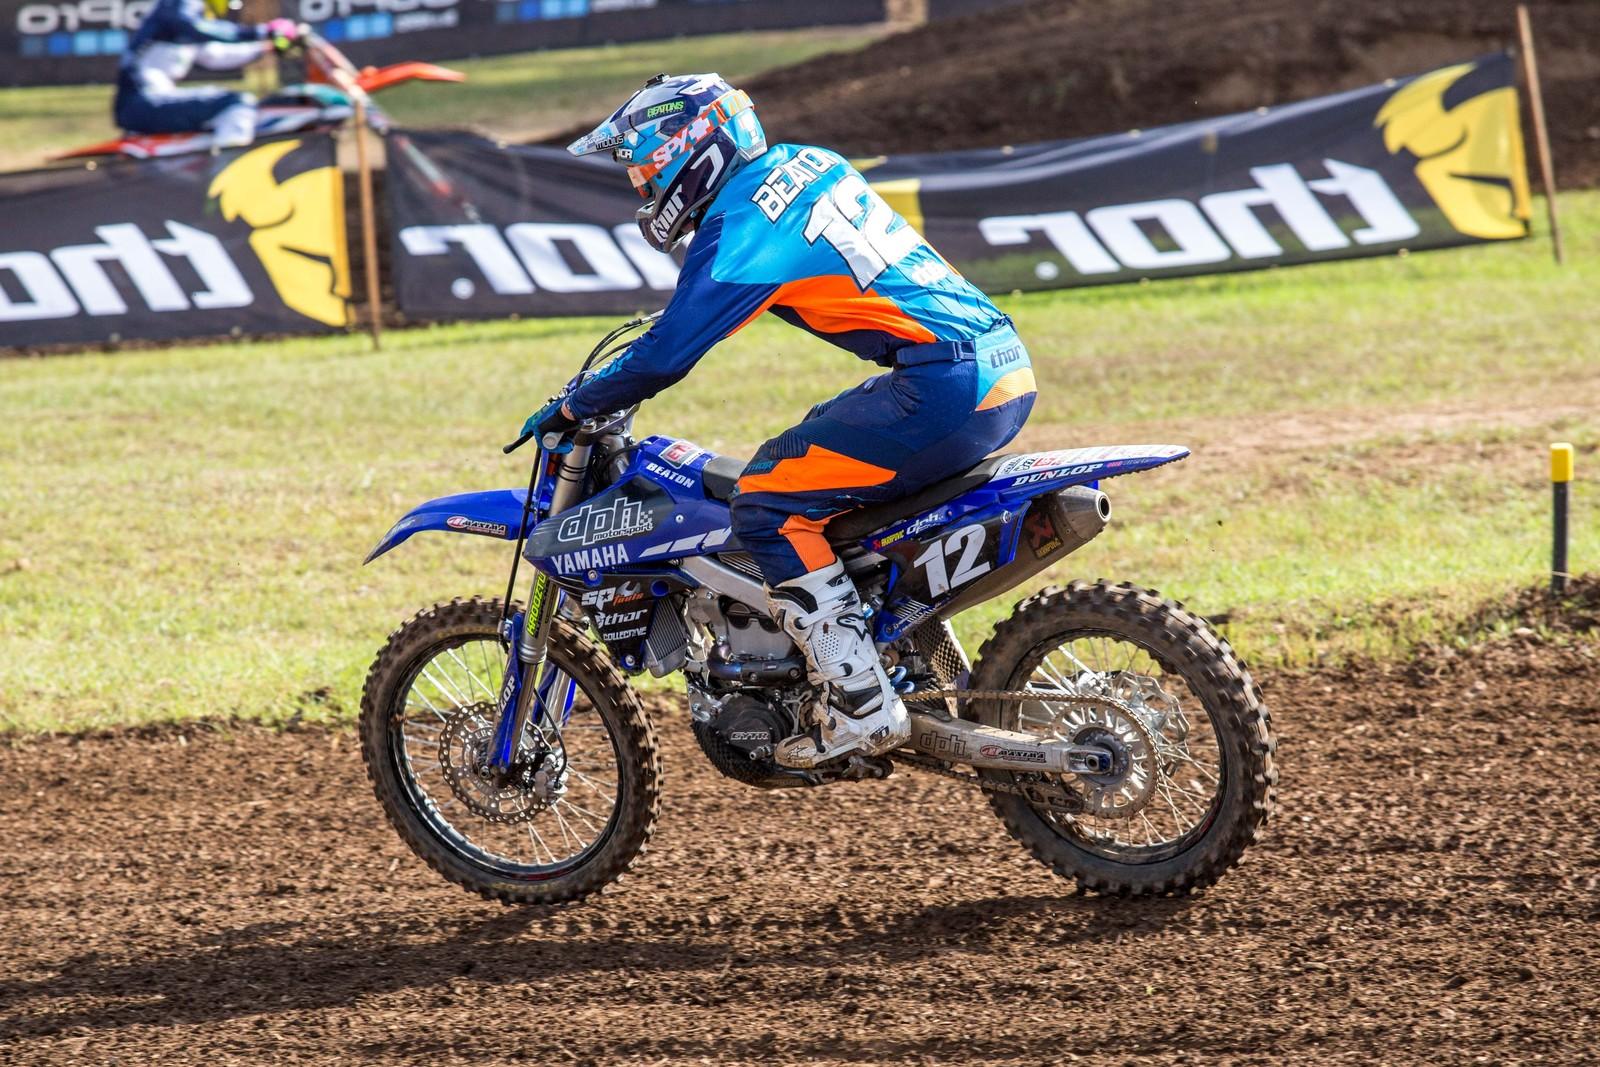 Jed Beaton - Australian Motul Motocross Nationals Round 2, Appin - Motocross Pictures - Vital MX